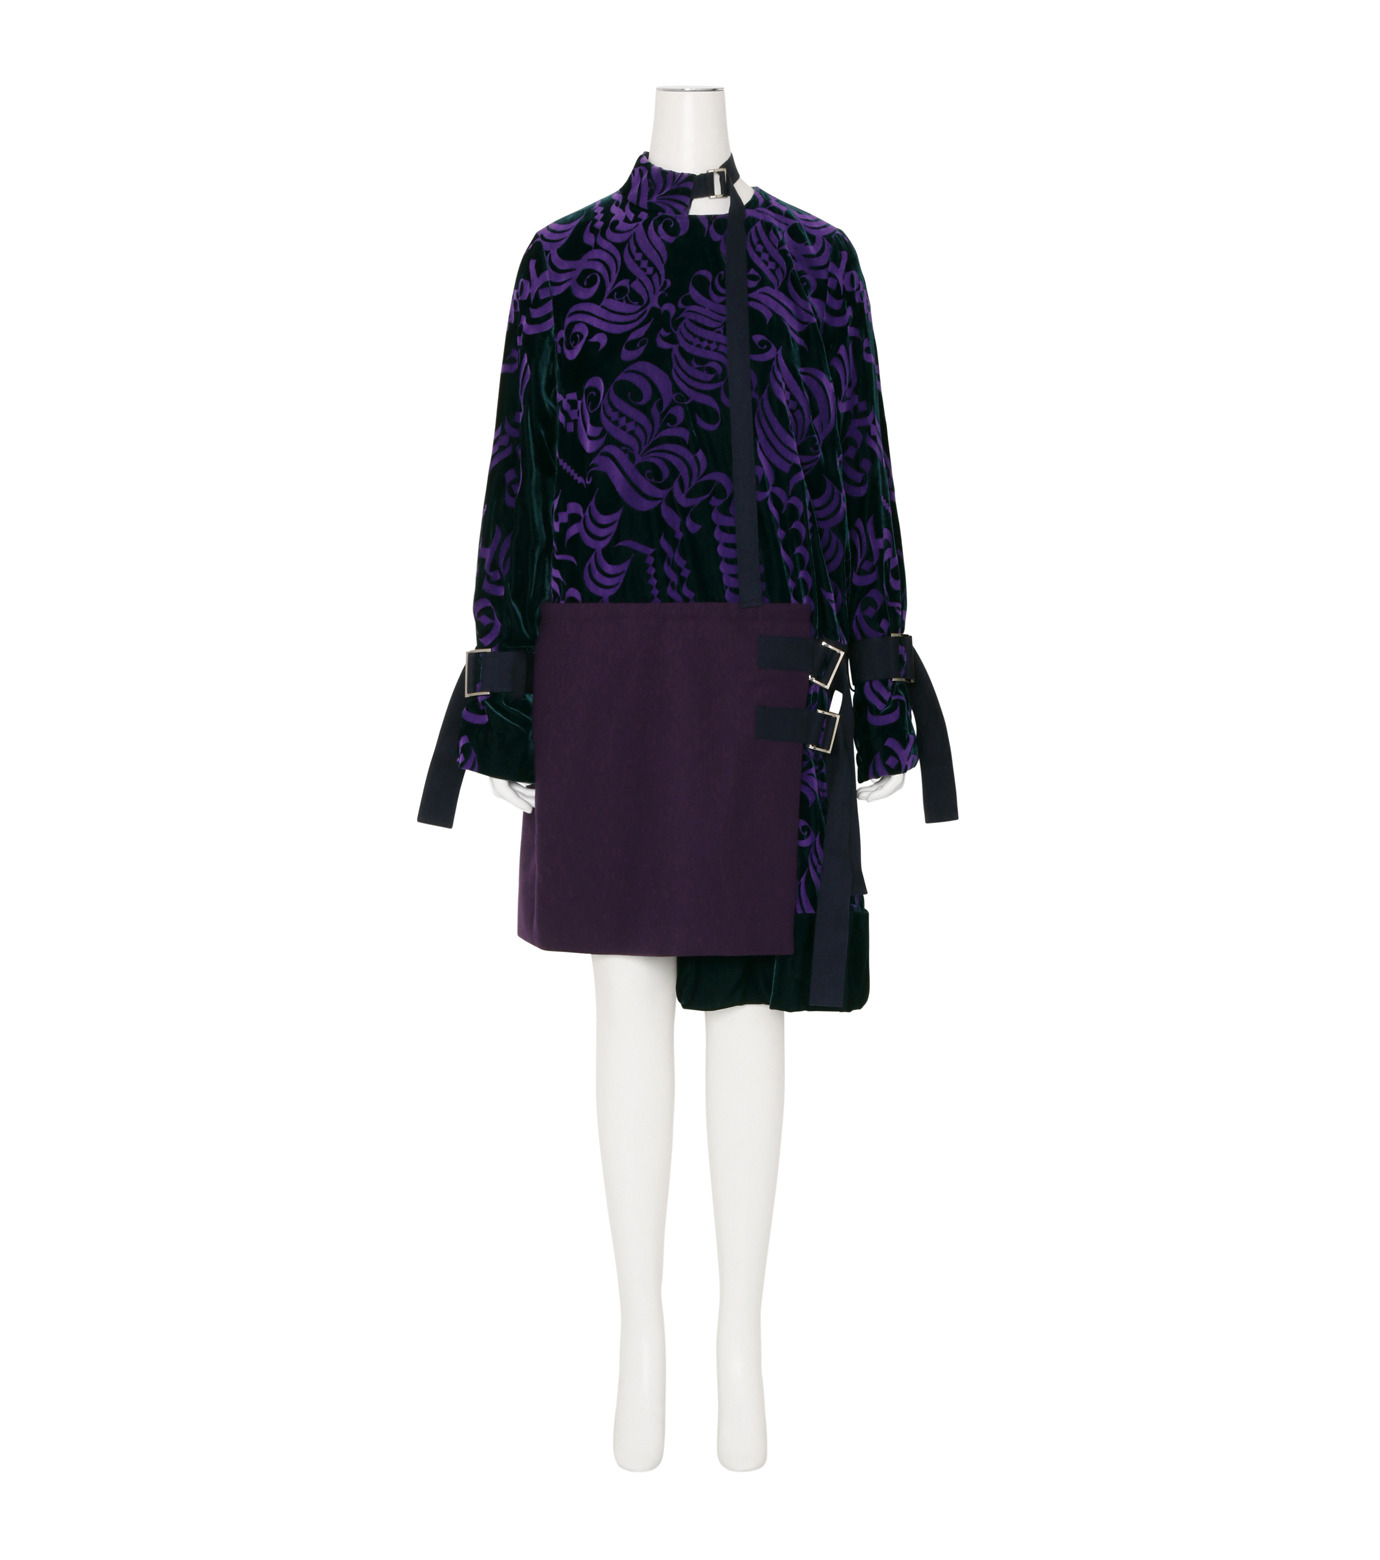 Sacai(サカイ)のVelvet Dress-PURPLE(ワンピース/one piece)-16-02877-82 拡大詳細画像1